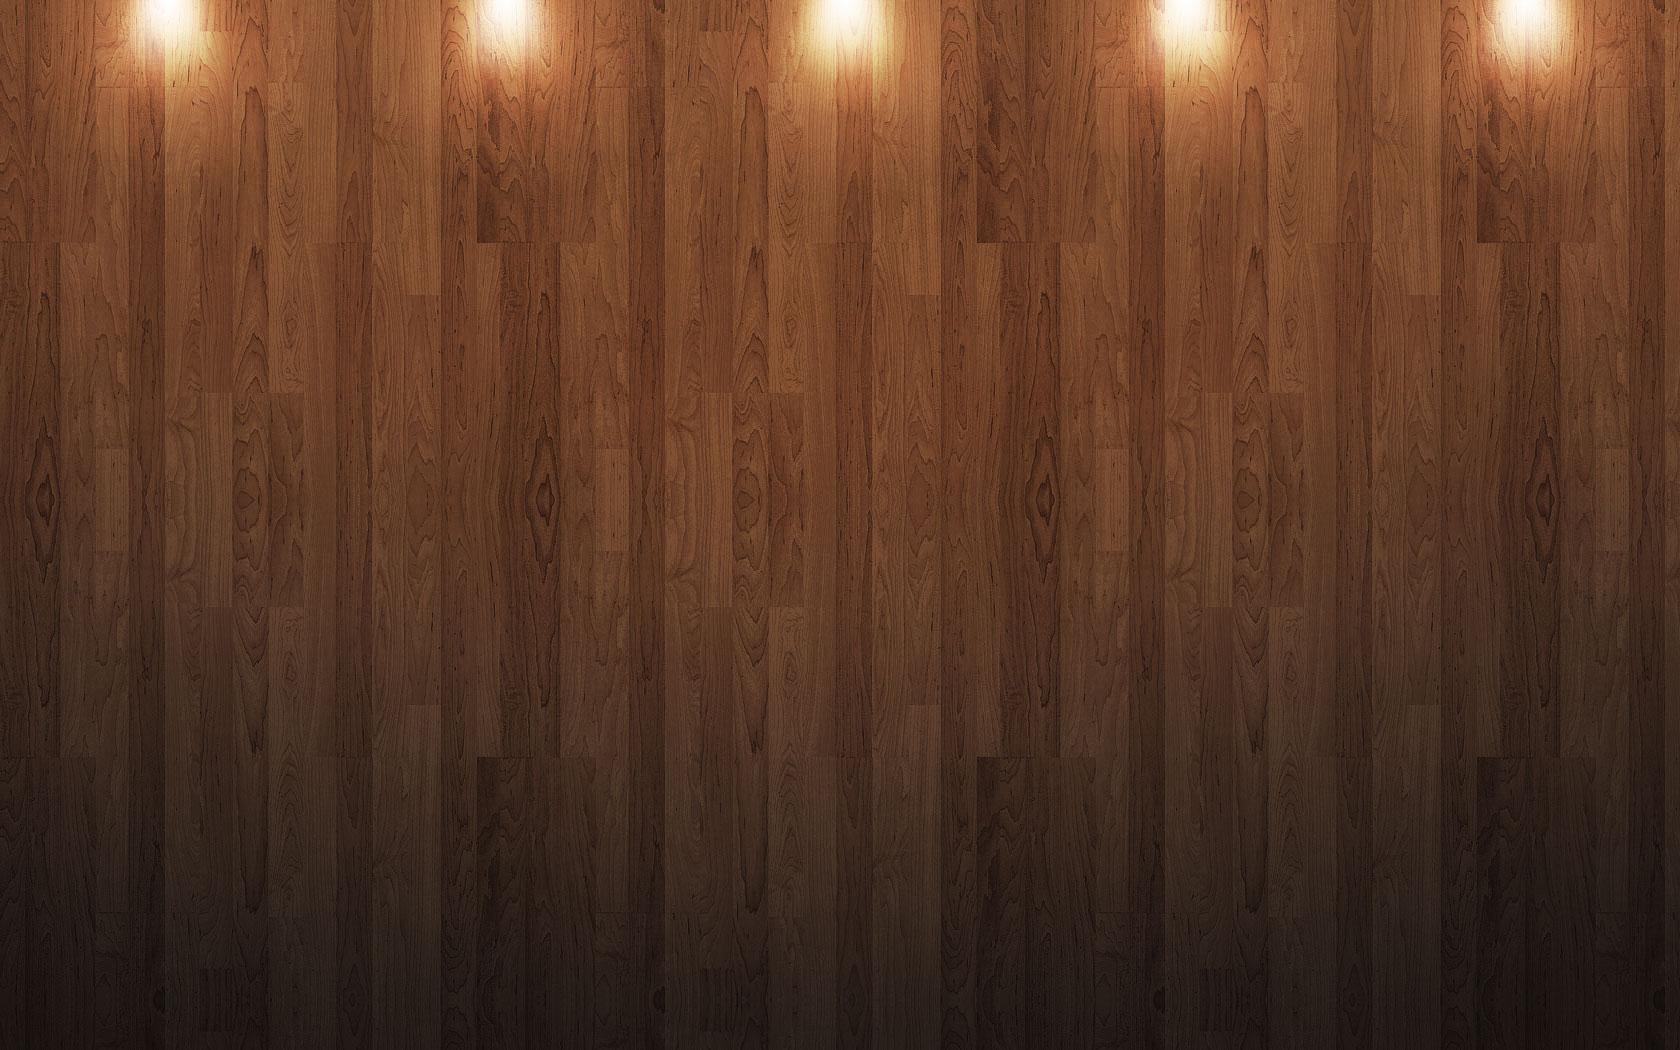 Desktop Backgrounds Light Wood